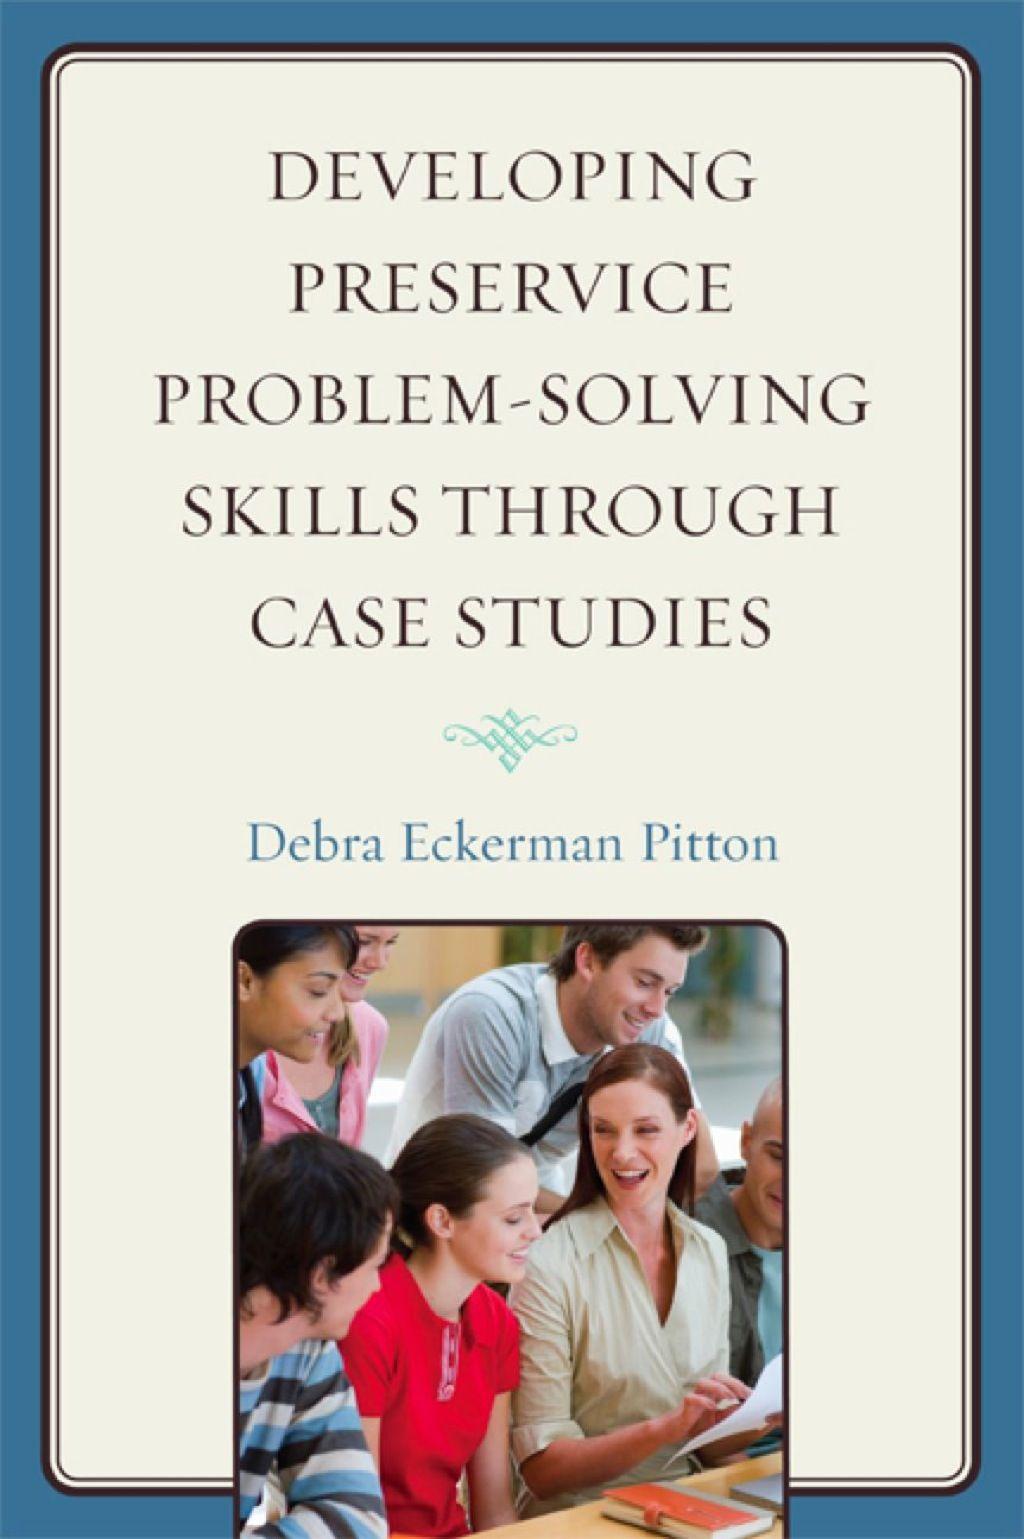 Developing preservice problemsolving skills through case